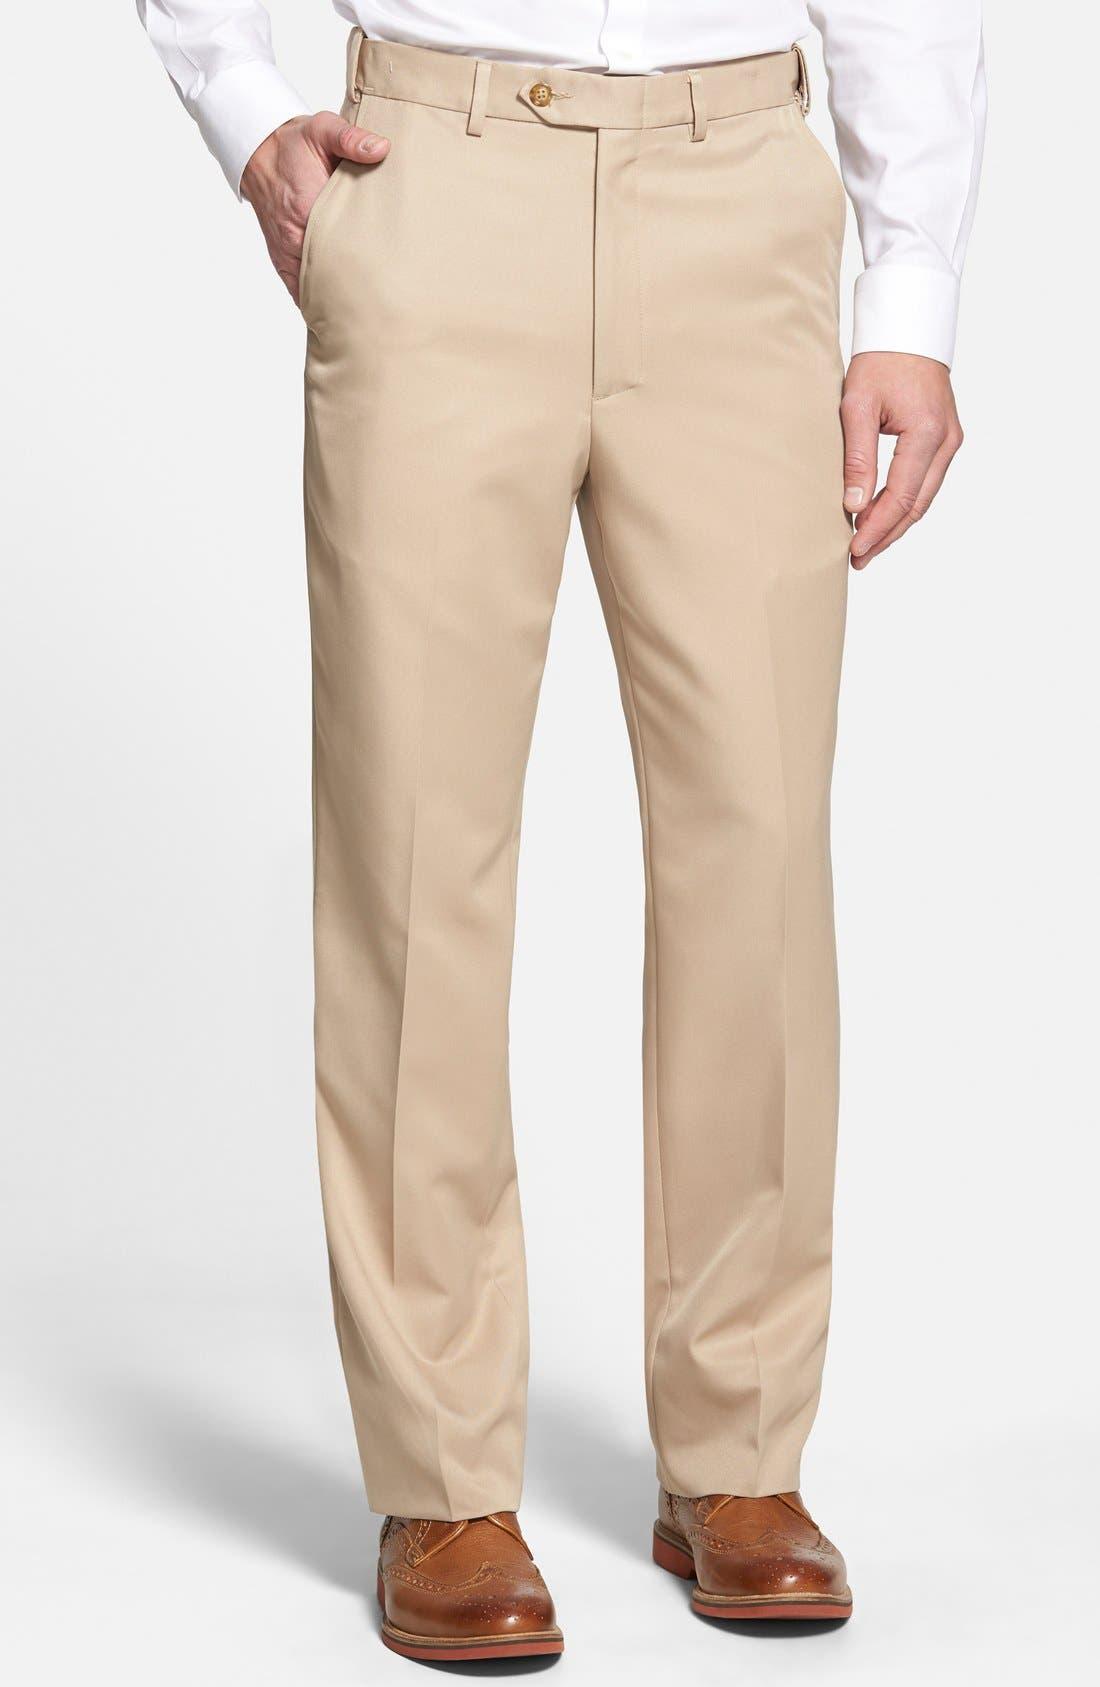 BERLE Self Sizer Waist Flat Front Trousers